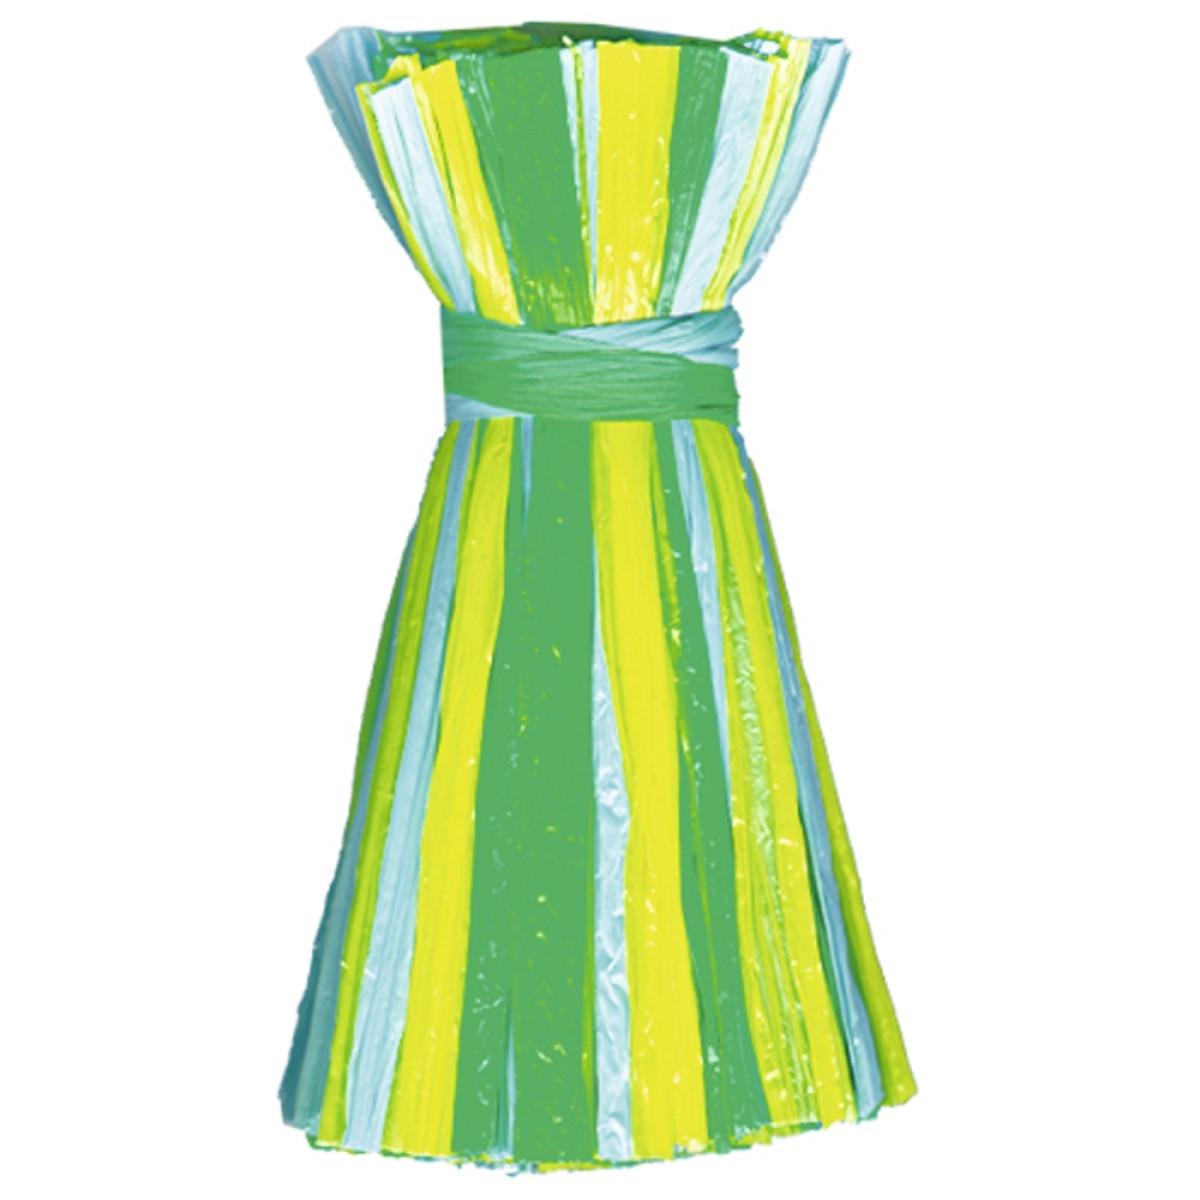 "Edelbast matt ""multicolor"" gelb/blau/grün - 30 Meter"